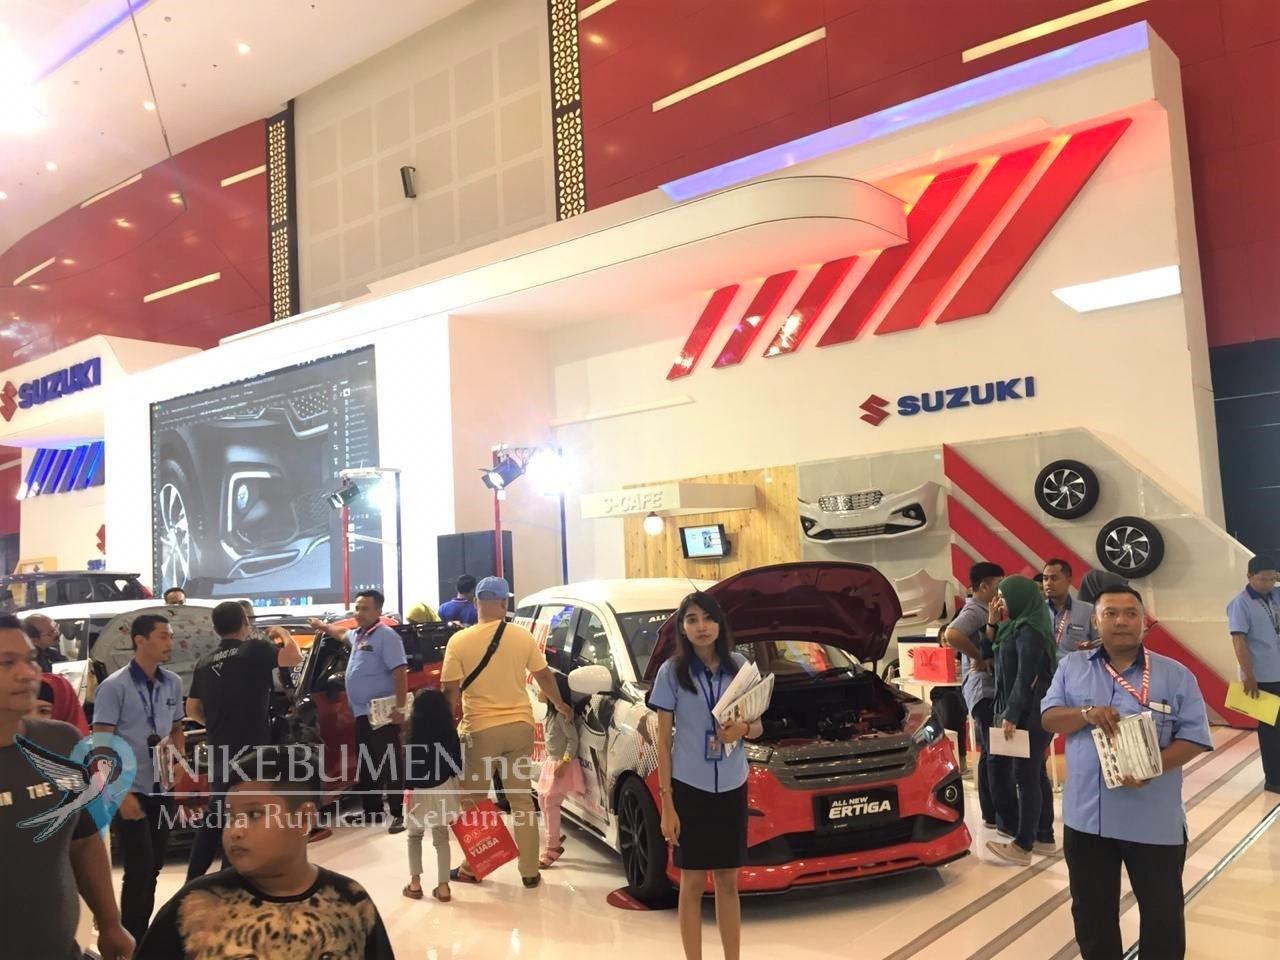 Suzuki Berhasil Menjual 869 Unit Kendaraan di GIIAS Surabaya 2019